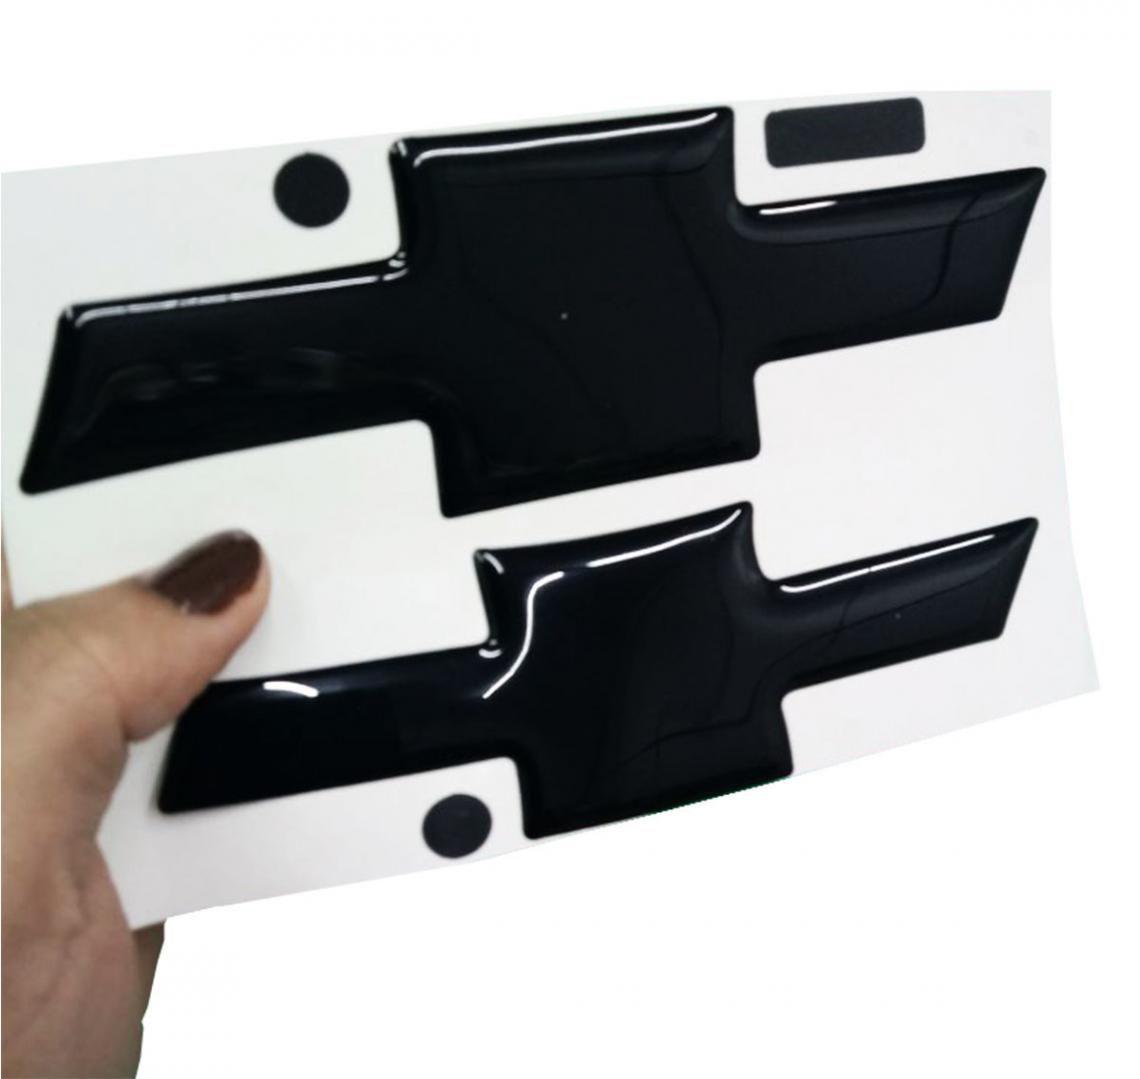 Gravata Adesiva Resinada Cruze Sedan até 2016 Black Piano